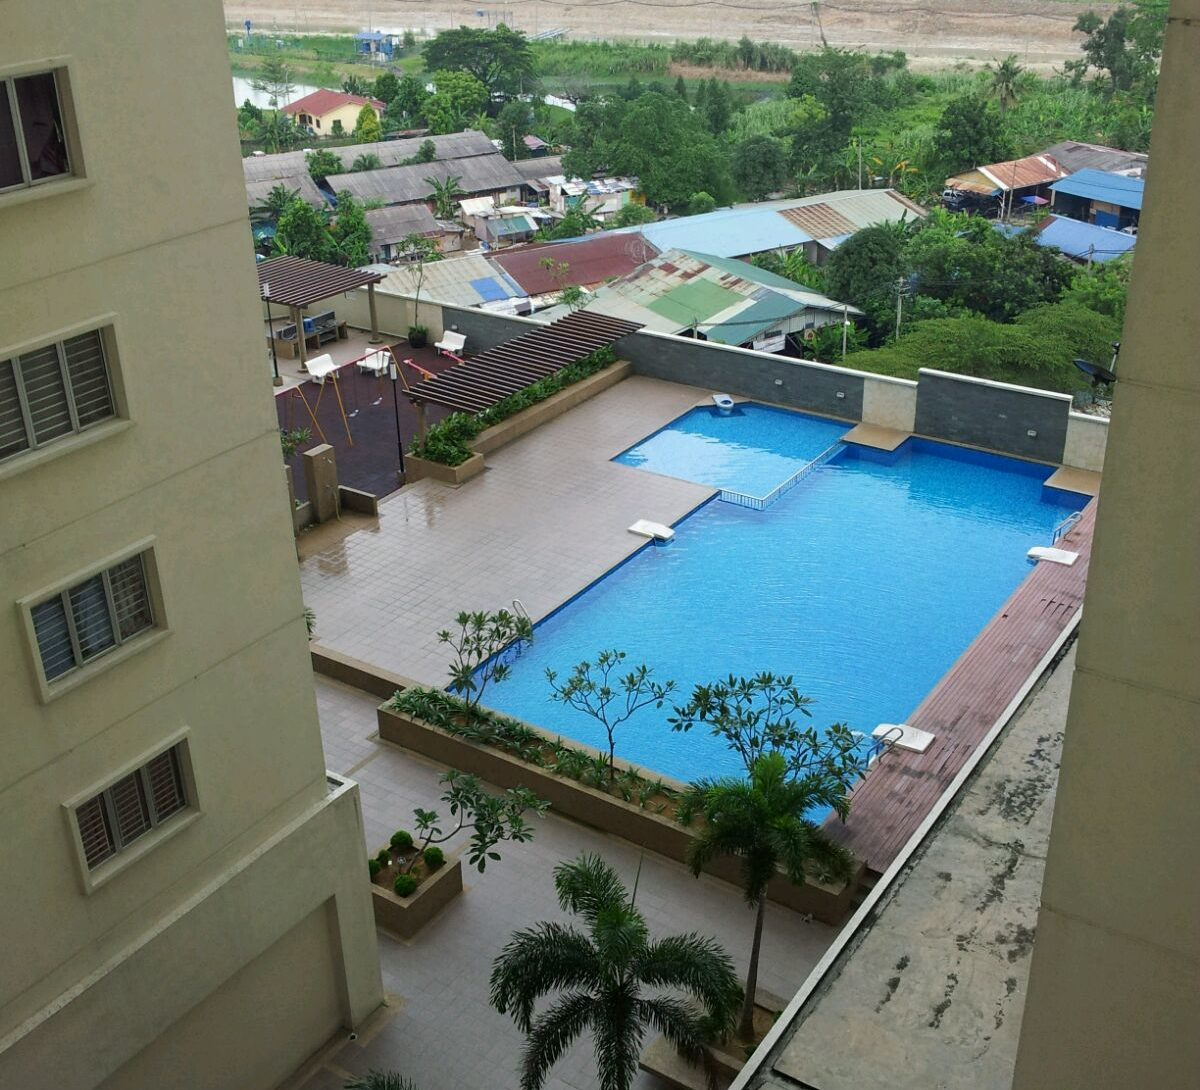 Alam Idaman Apartment Batu 3 Shah Alam For Sale!